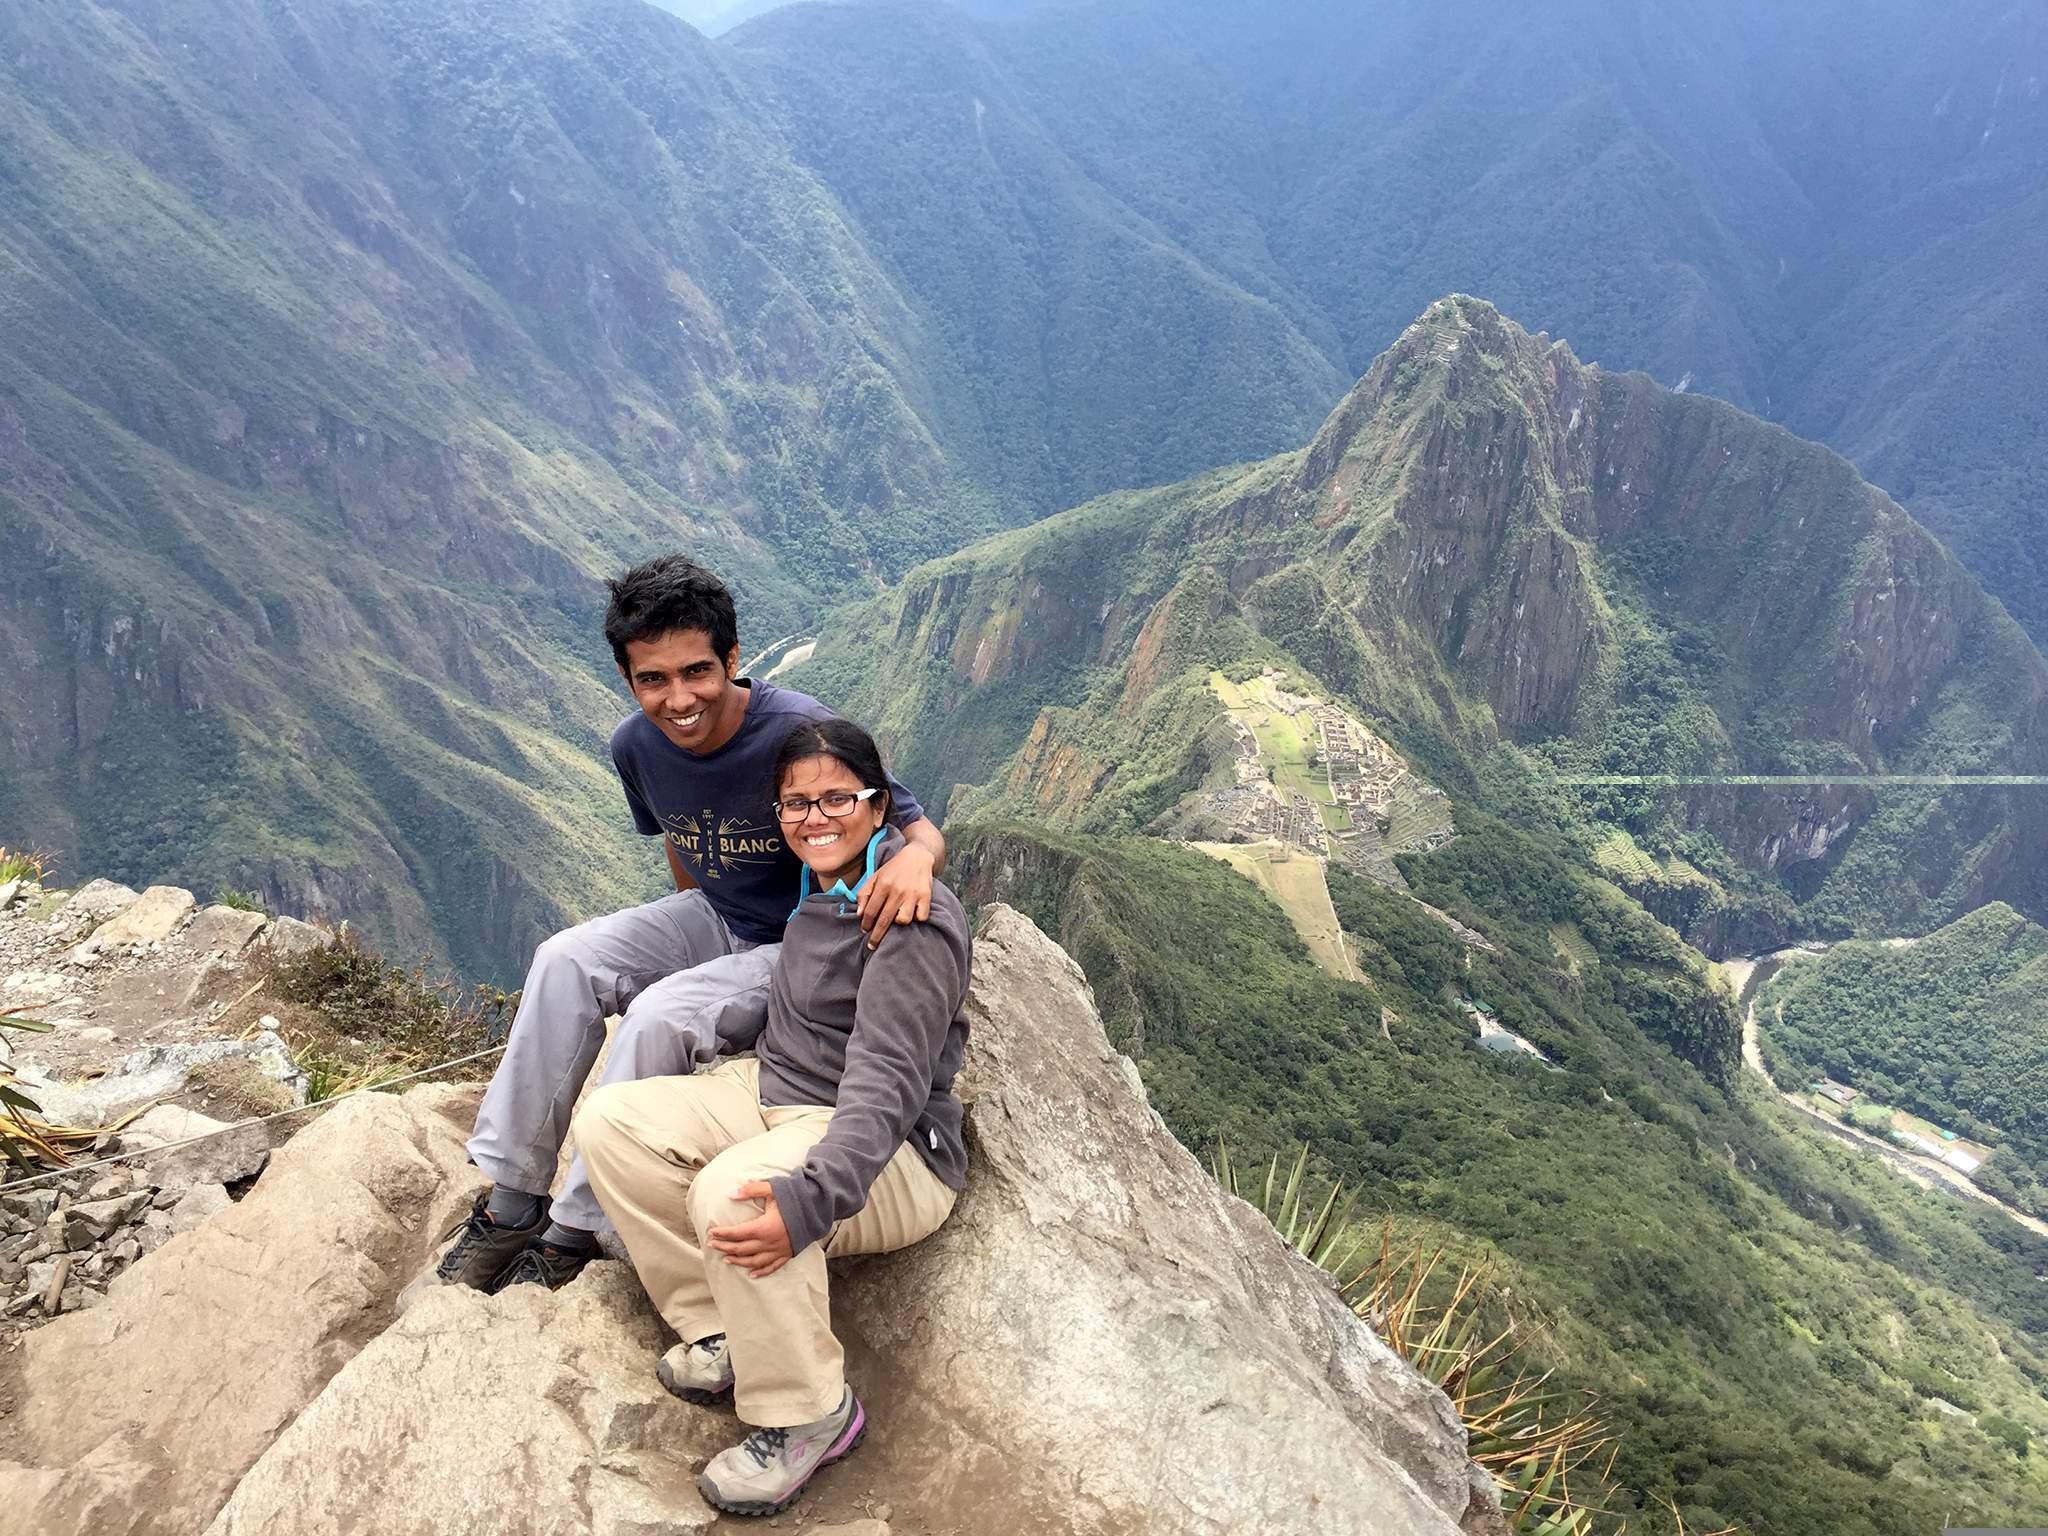 Sandeepa and Chetan crossing the Amazon